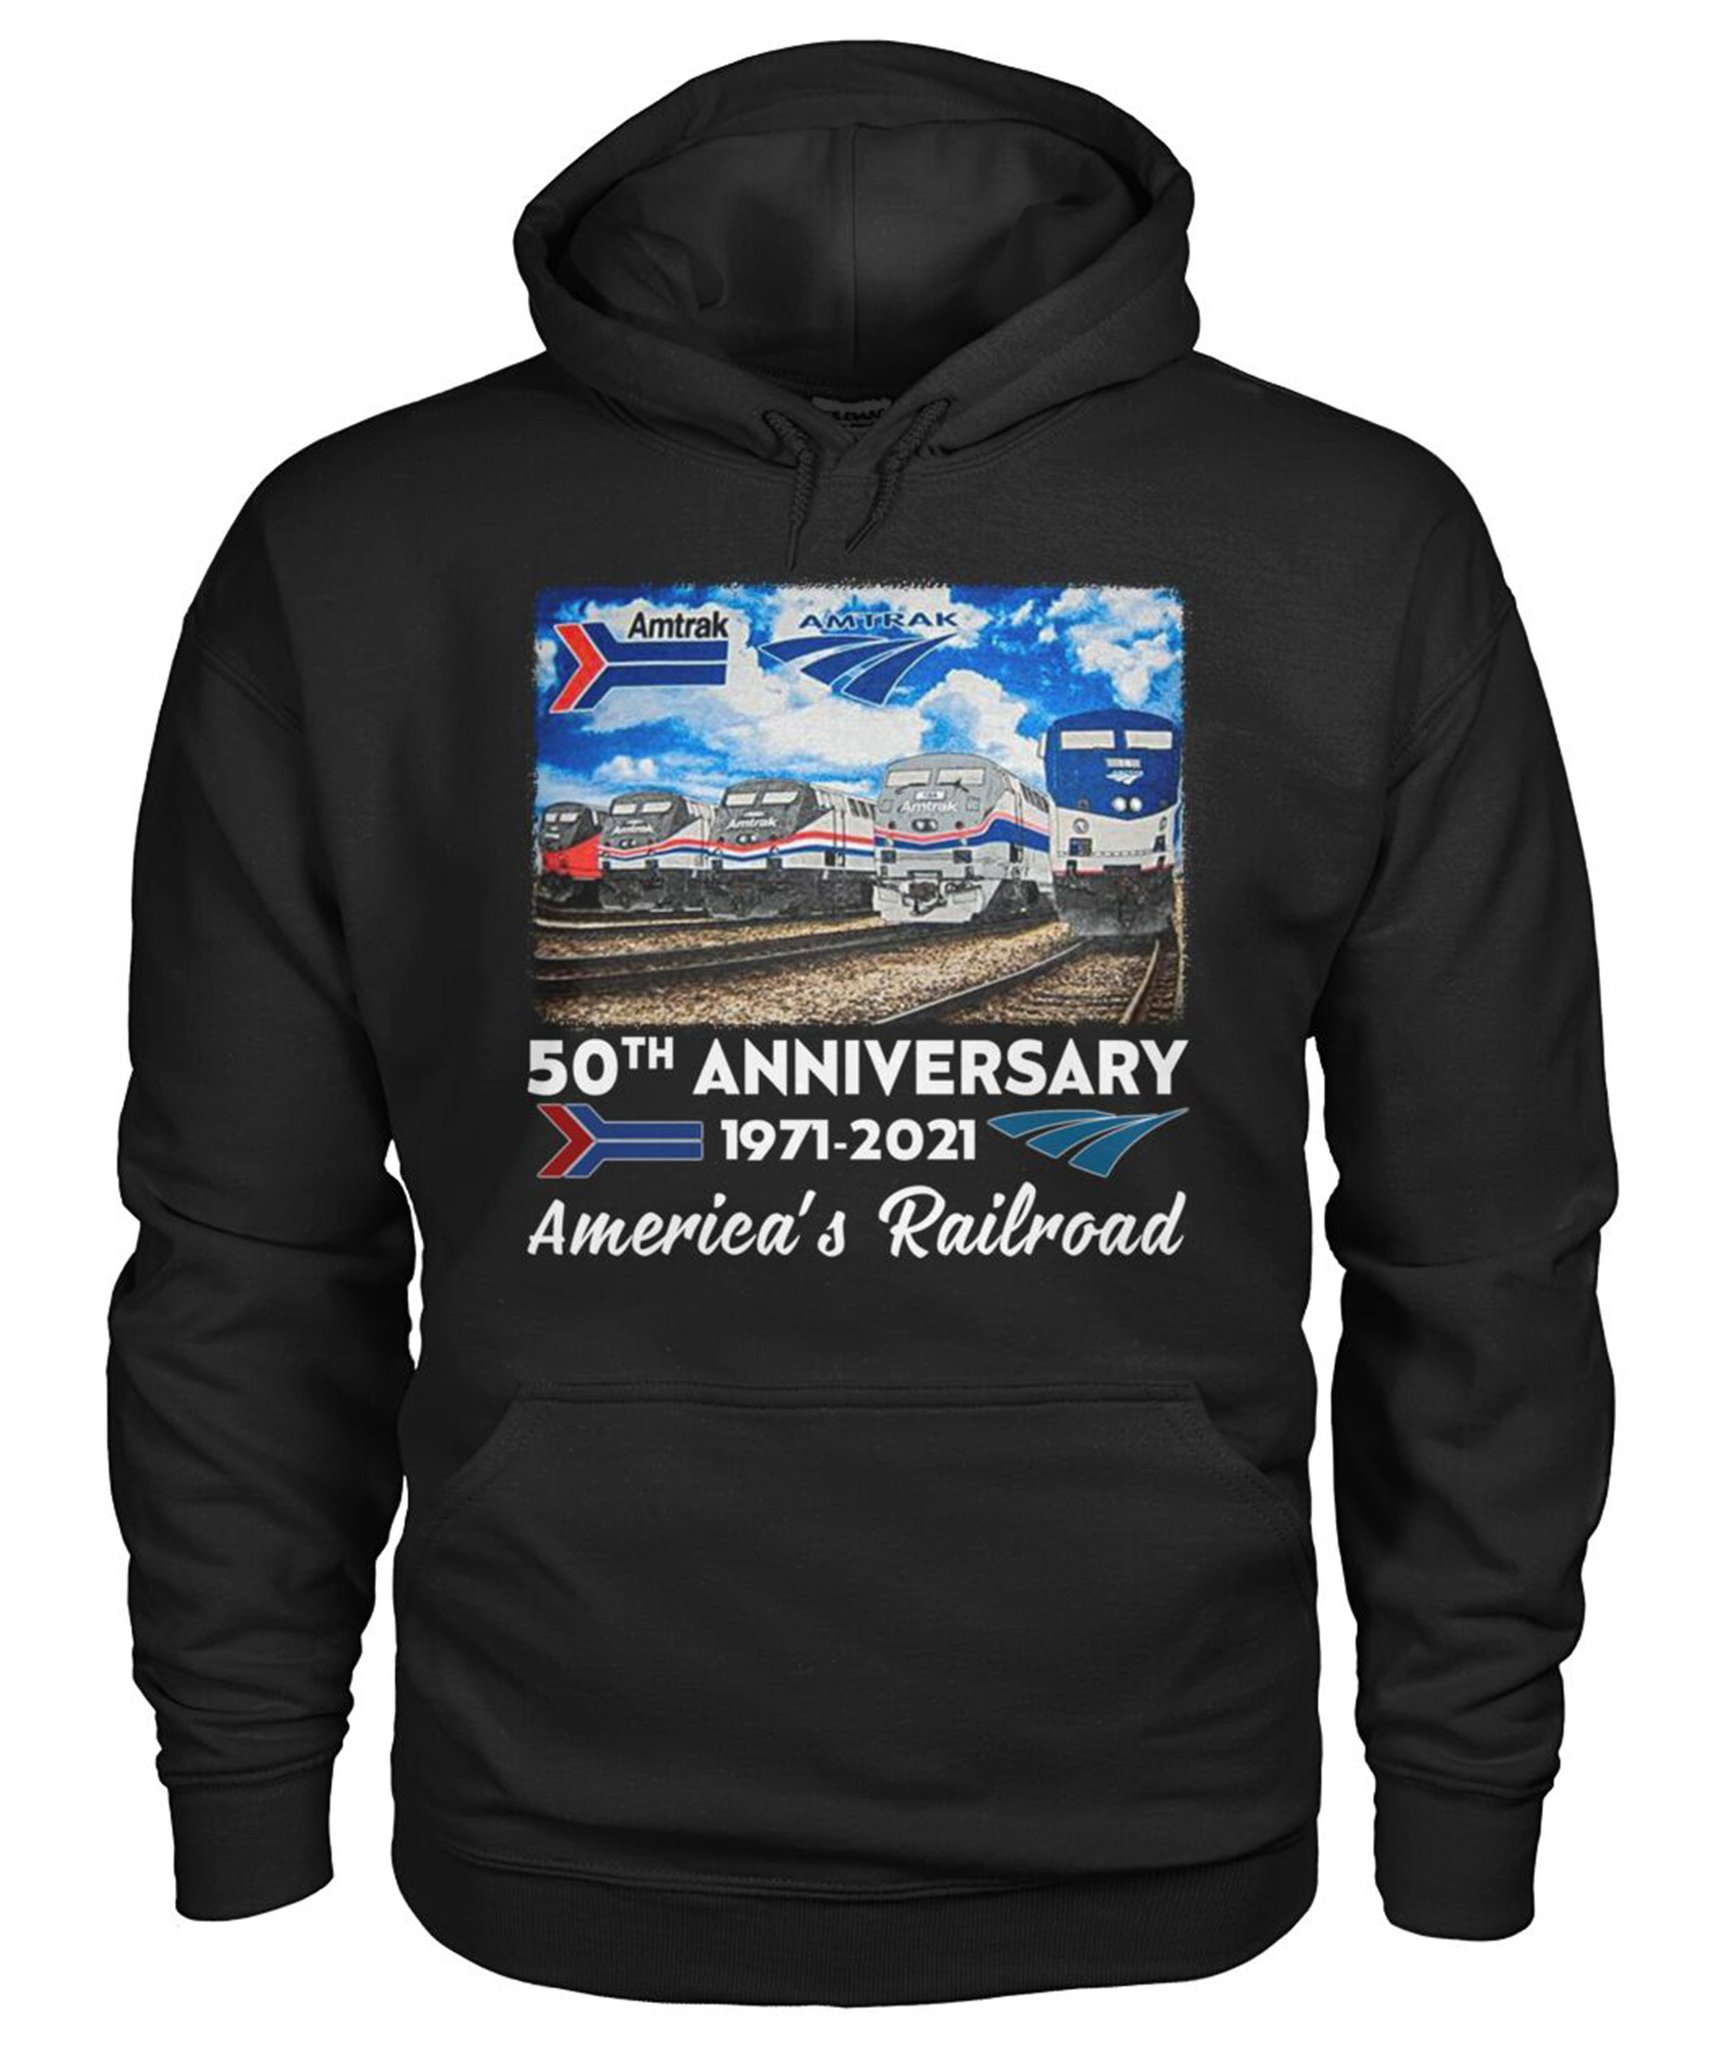 50th Anniversary 1971 2021 America's Railroad Shirt 10